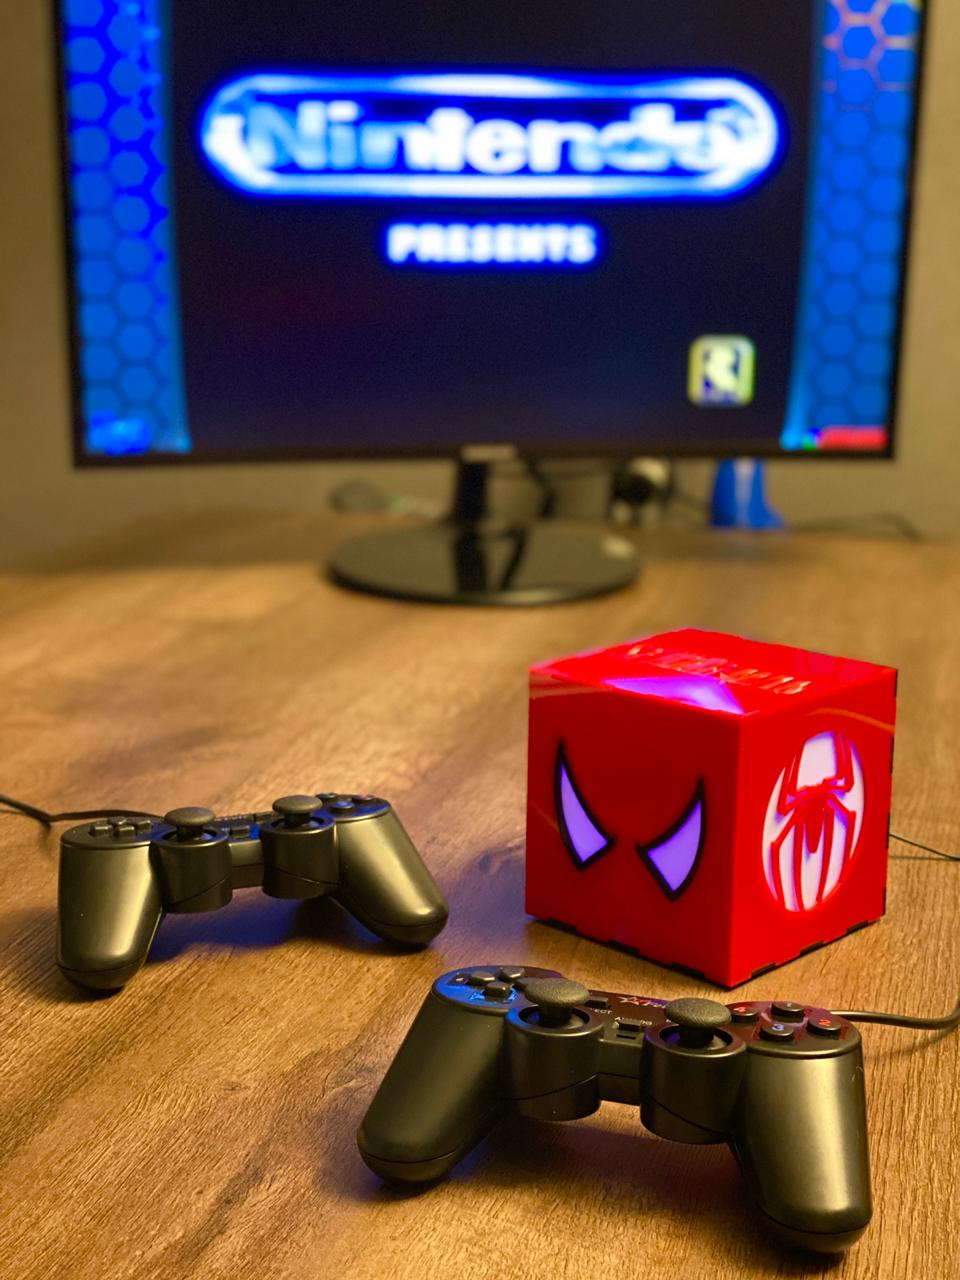 Cubo Retrô Box Homem-Aranha: Fliperama Arcade Game (20.000 Jogos) PlayStation/Nintendo/SNES/Mega Drive/Sega Saturn